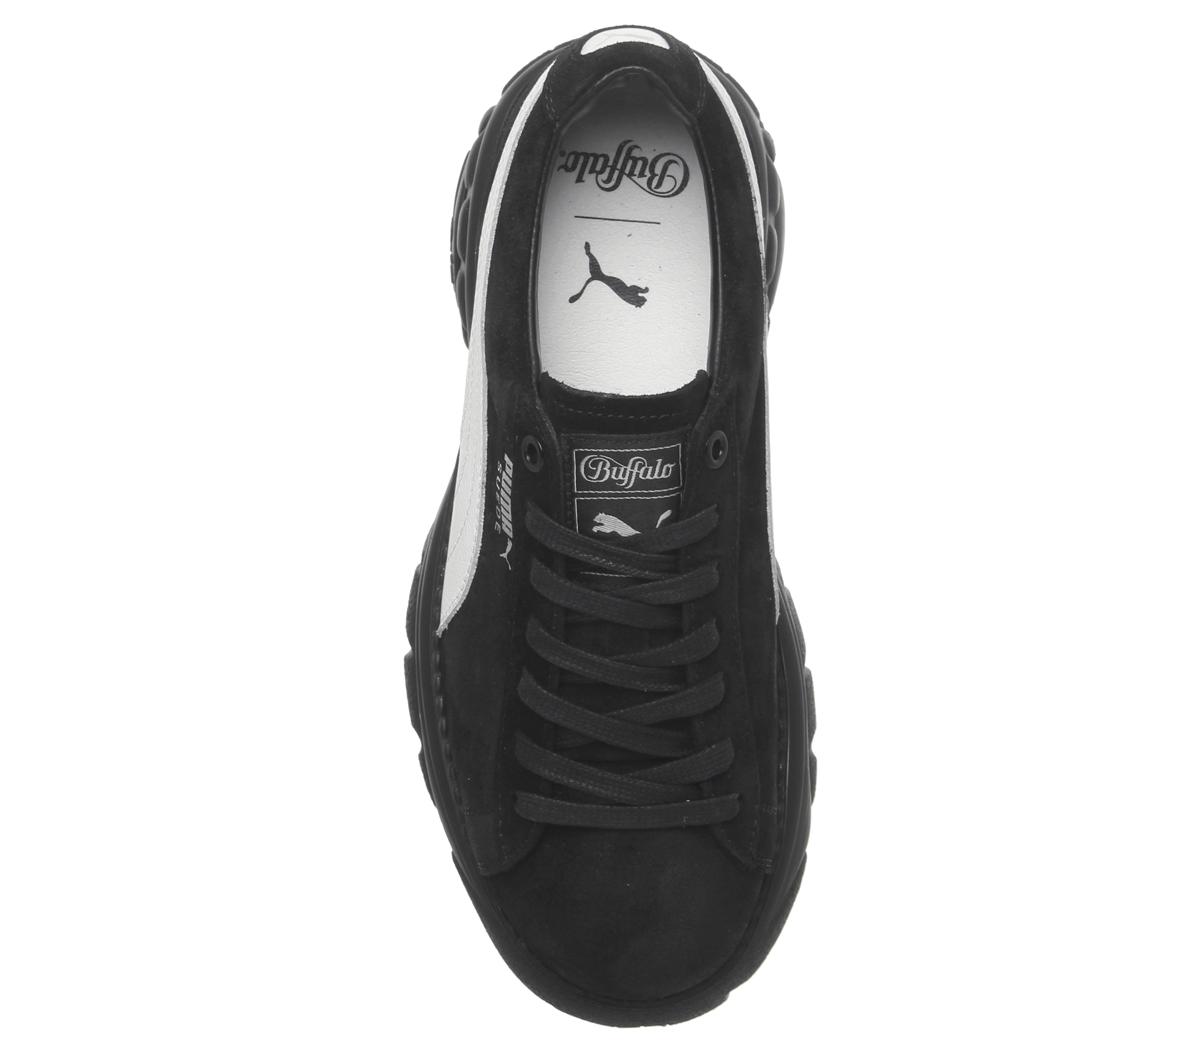 906fdd13f2c82 SENTINEL Donna Puma Suede Buffalo scarpe da ginnastica Puma scarpe da  ginnastica scarpe nere